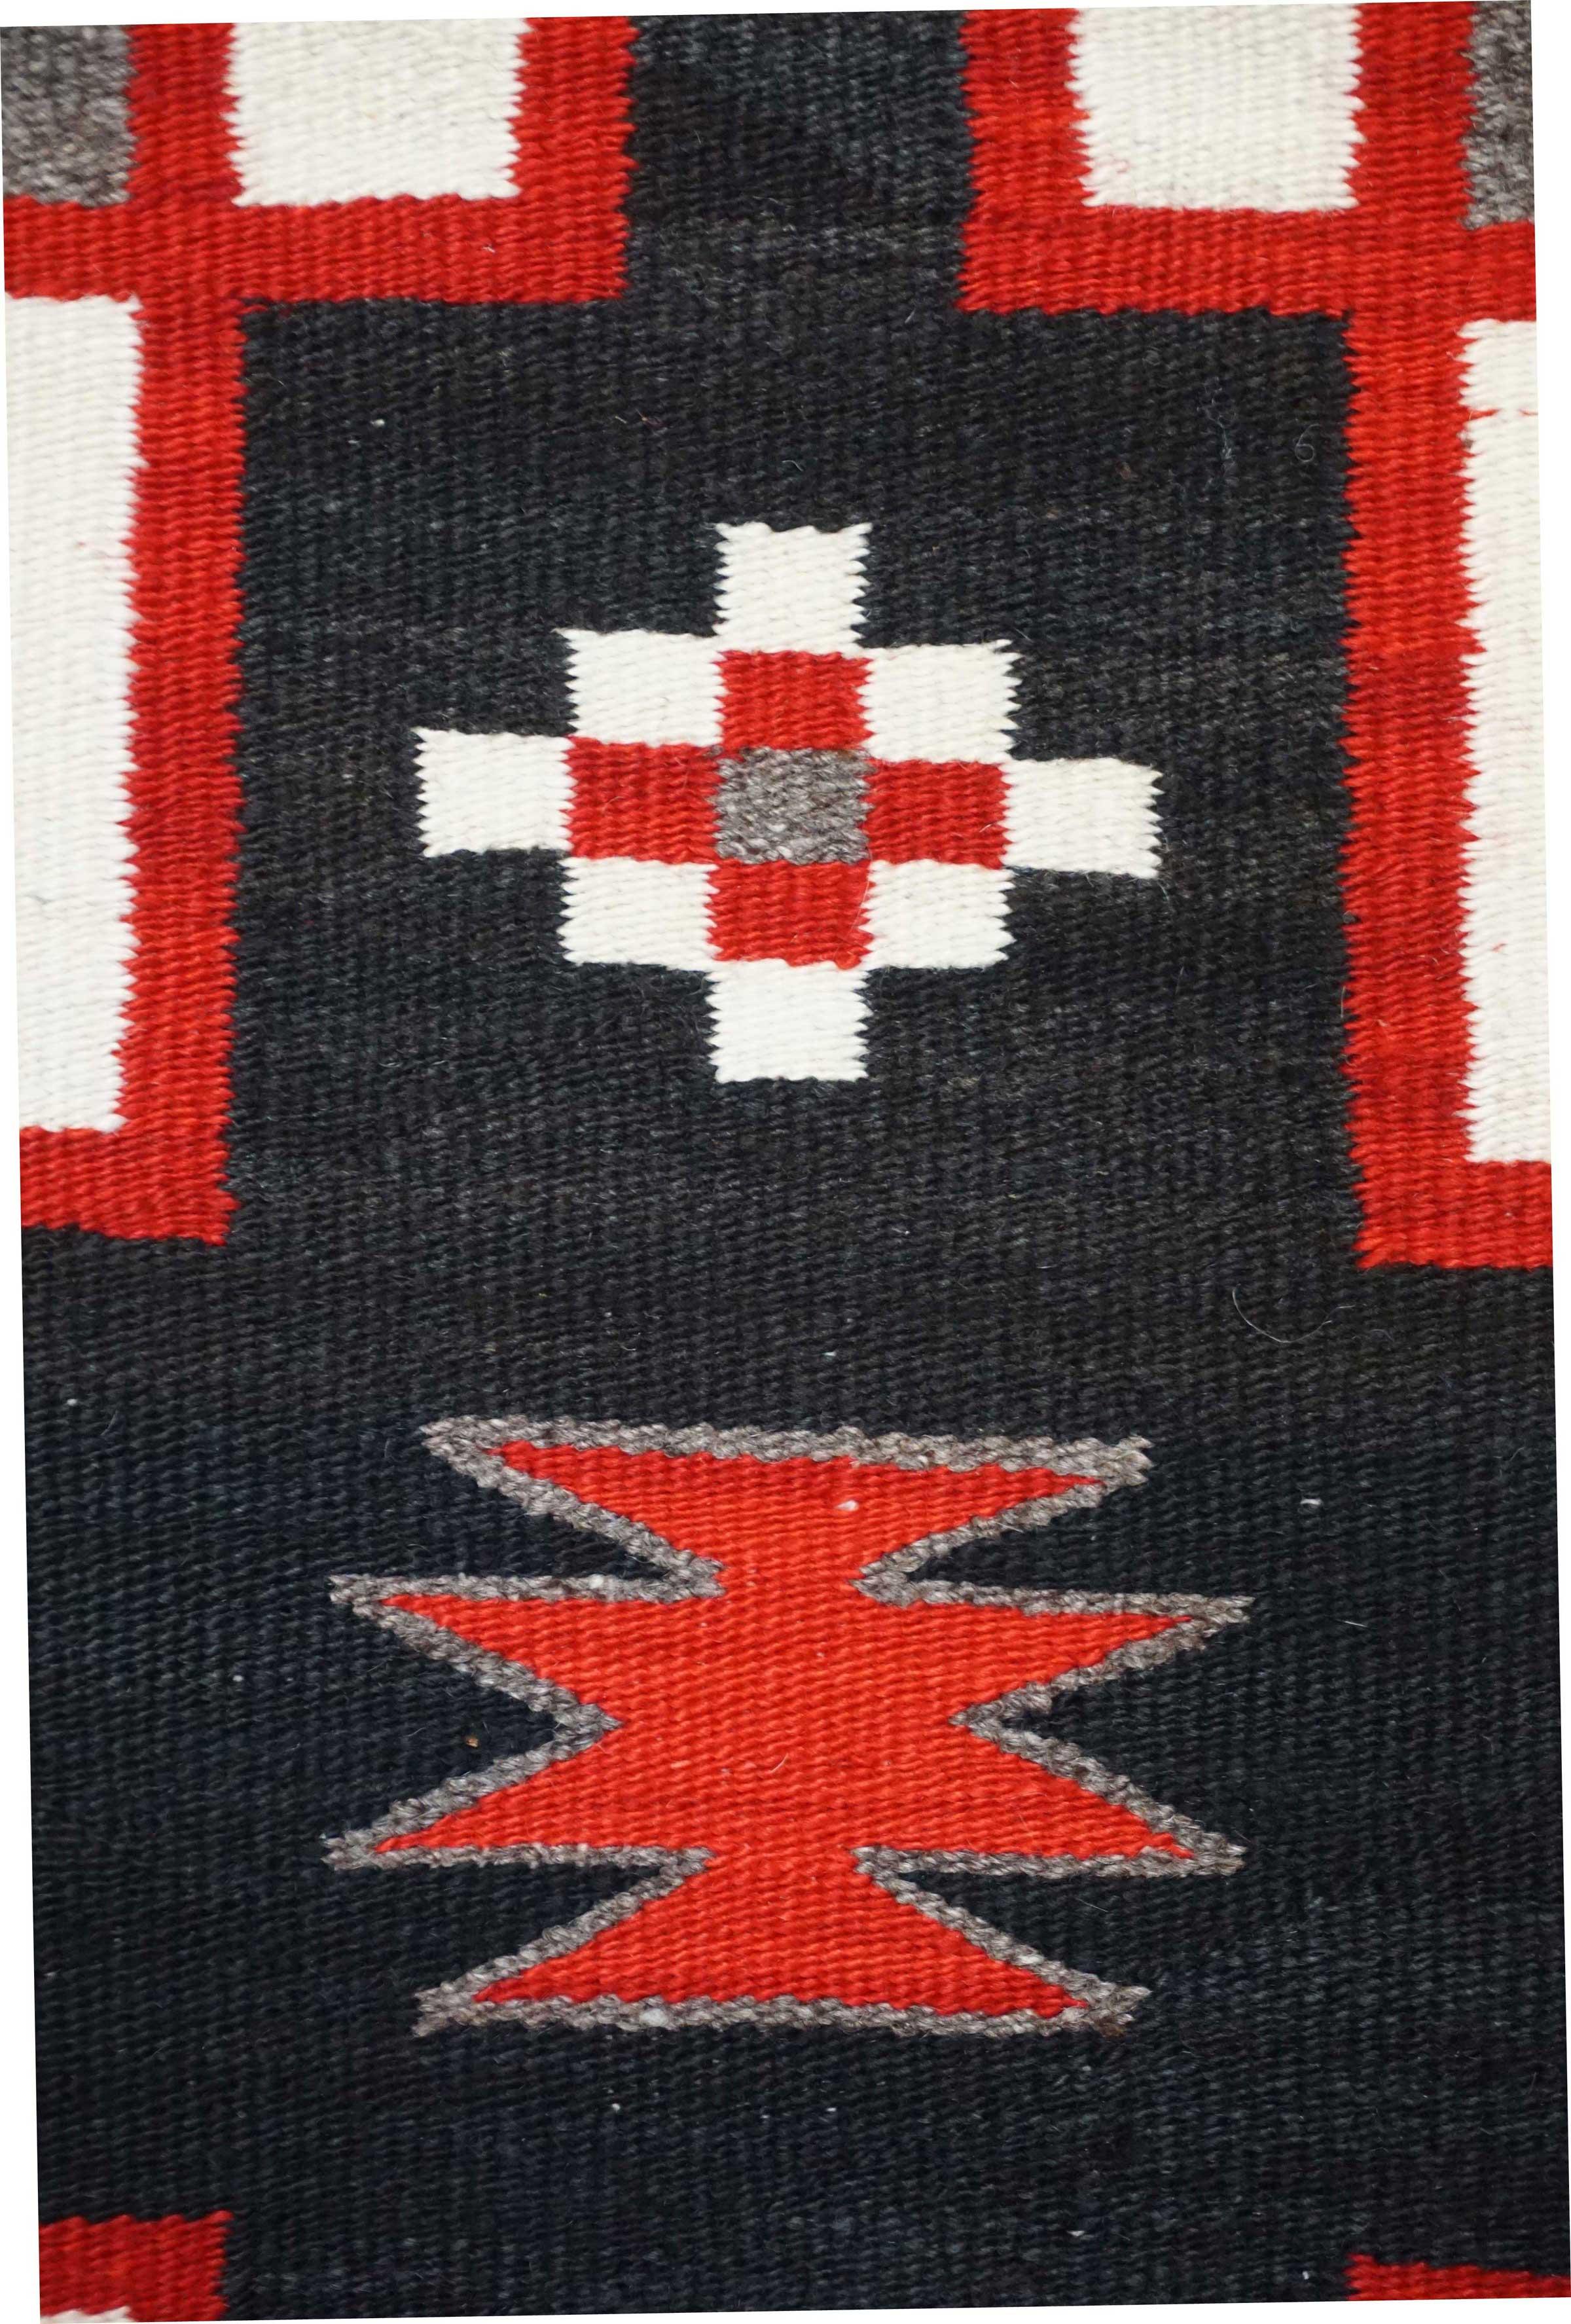 Jb Moore Crystal Trading Post Double Navajo Saddle Blanket 828